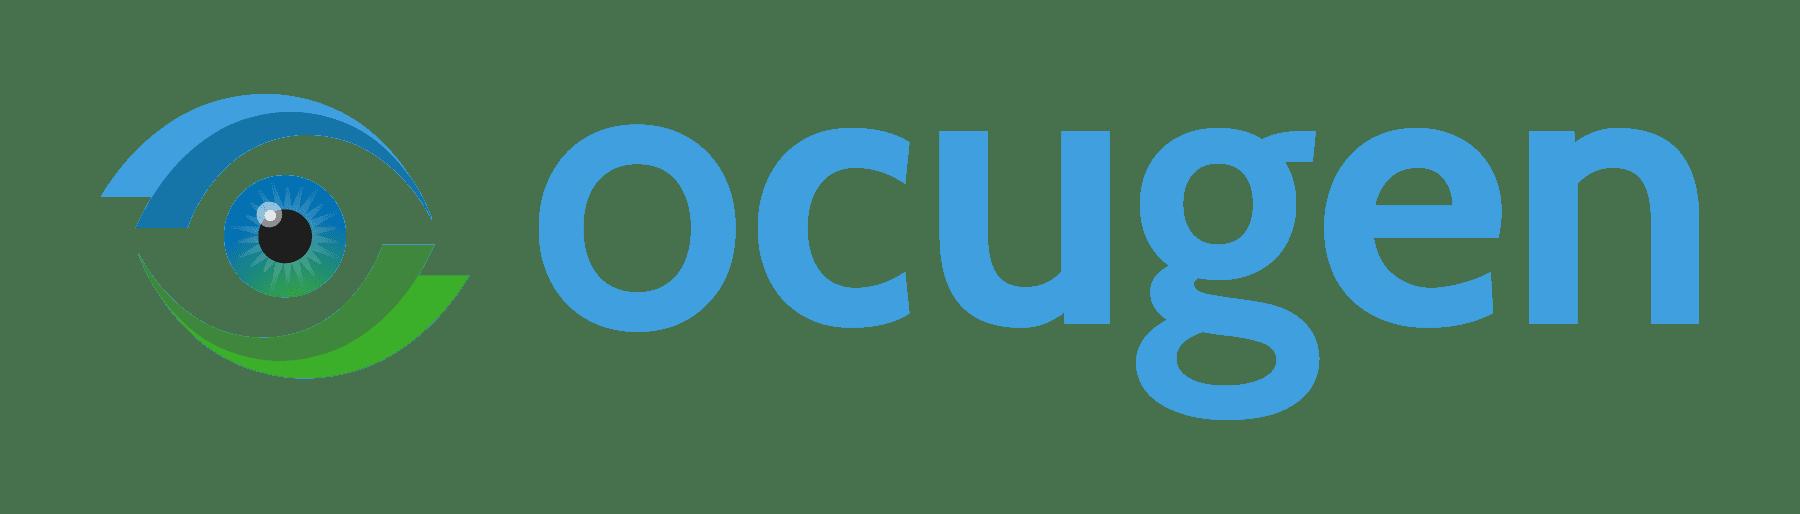 ocugen - crunchbase company profile & funding